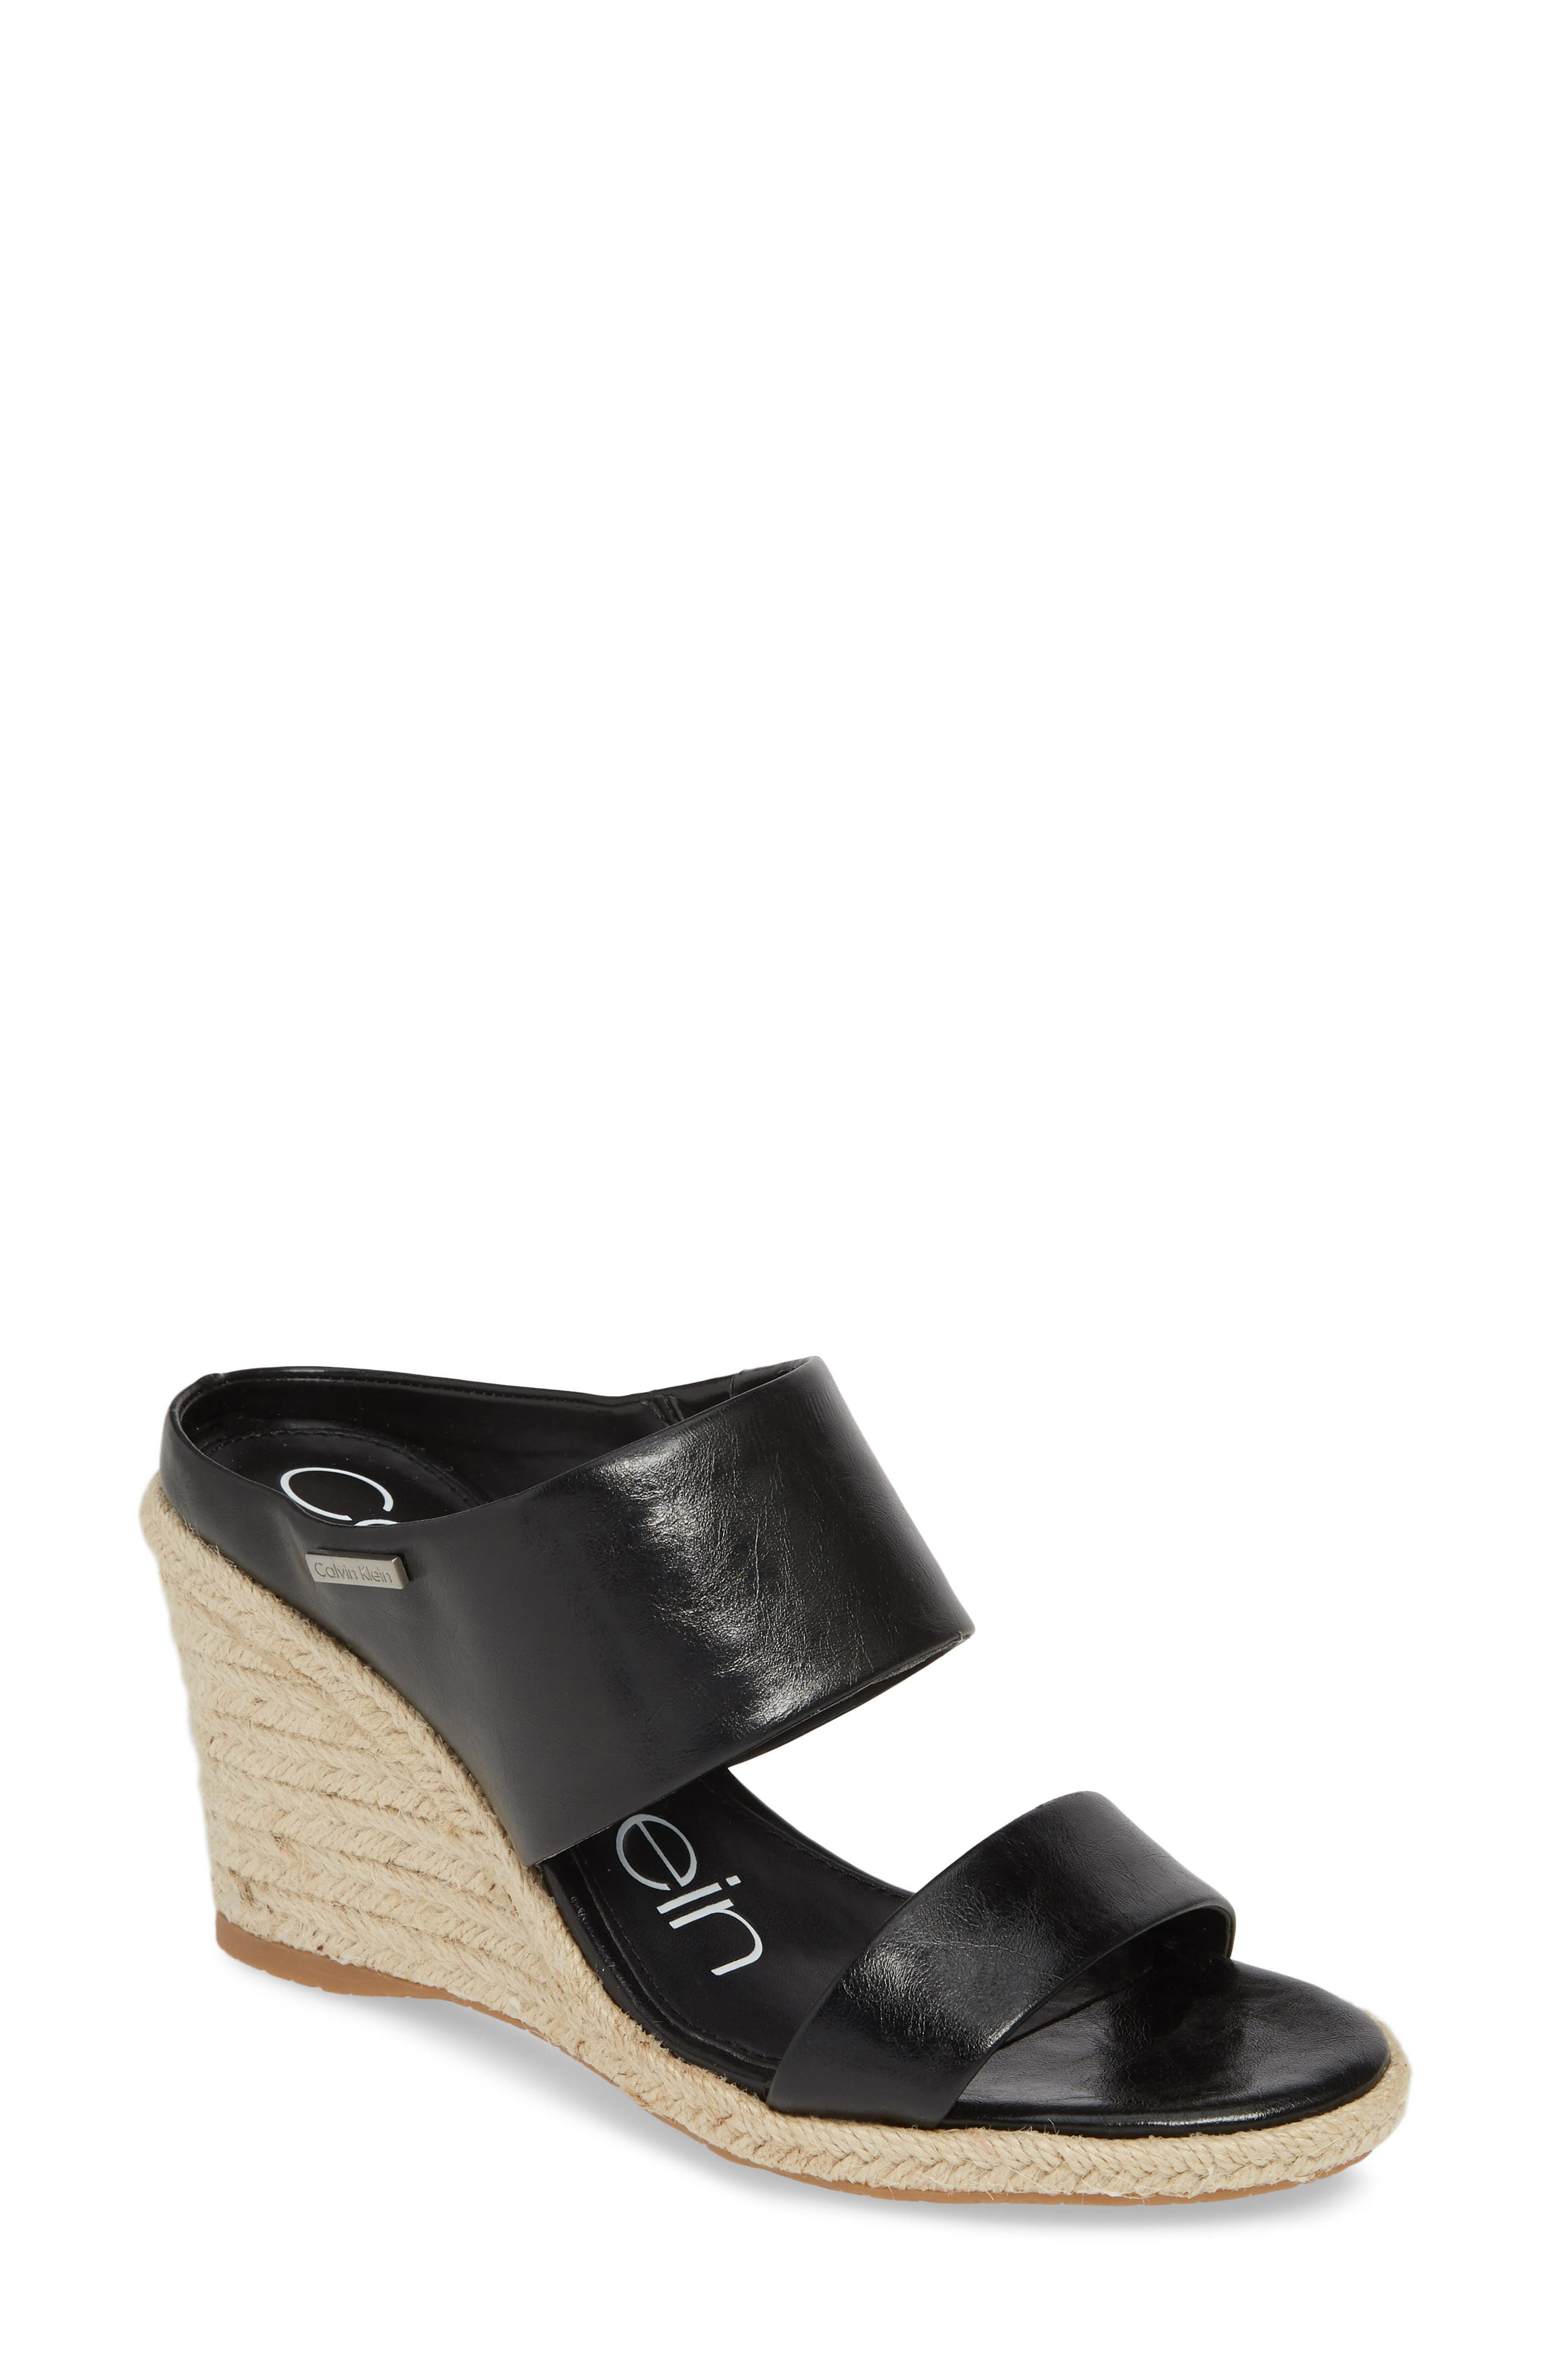 40a32d924d Calvin Klein Brooke Espadrille Wedge Sandal- Black